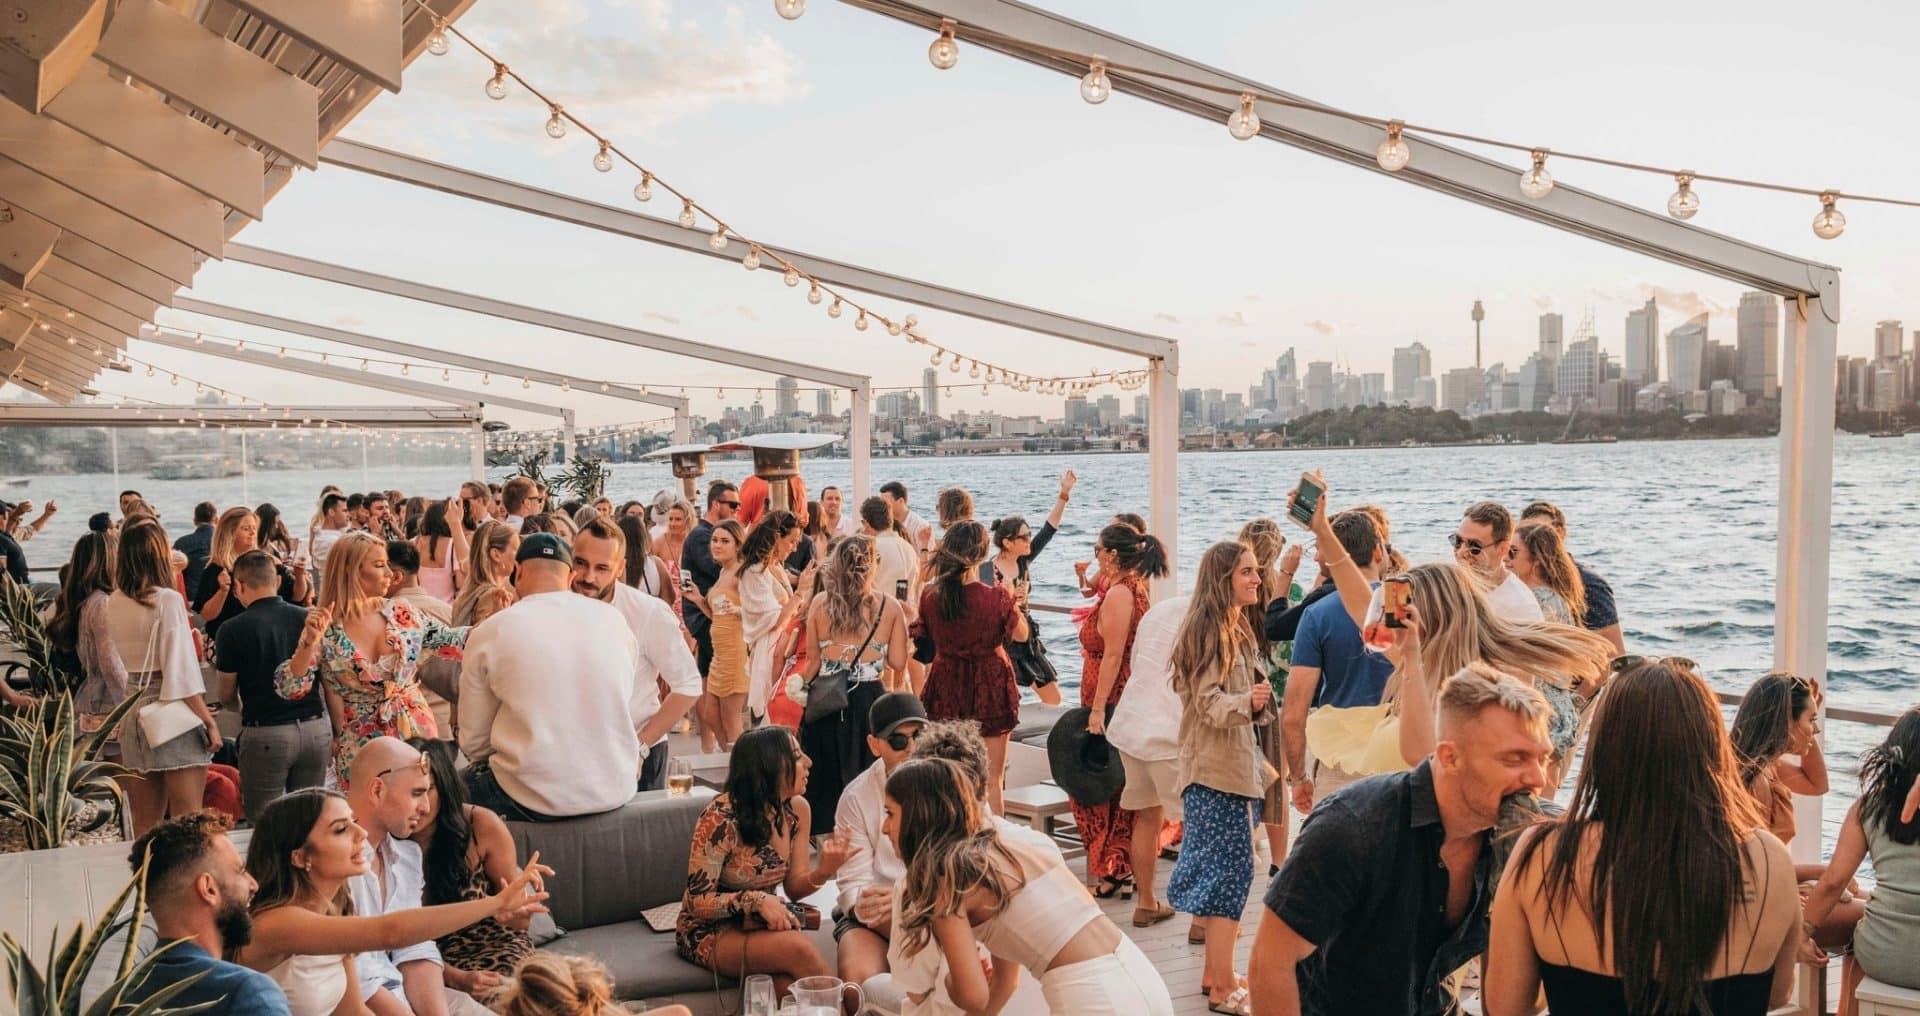 Best Beach Bars in Sydney